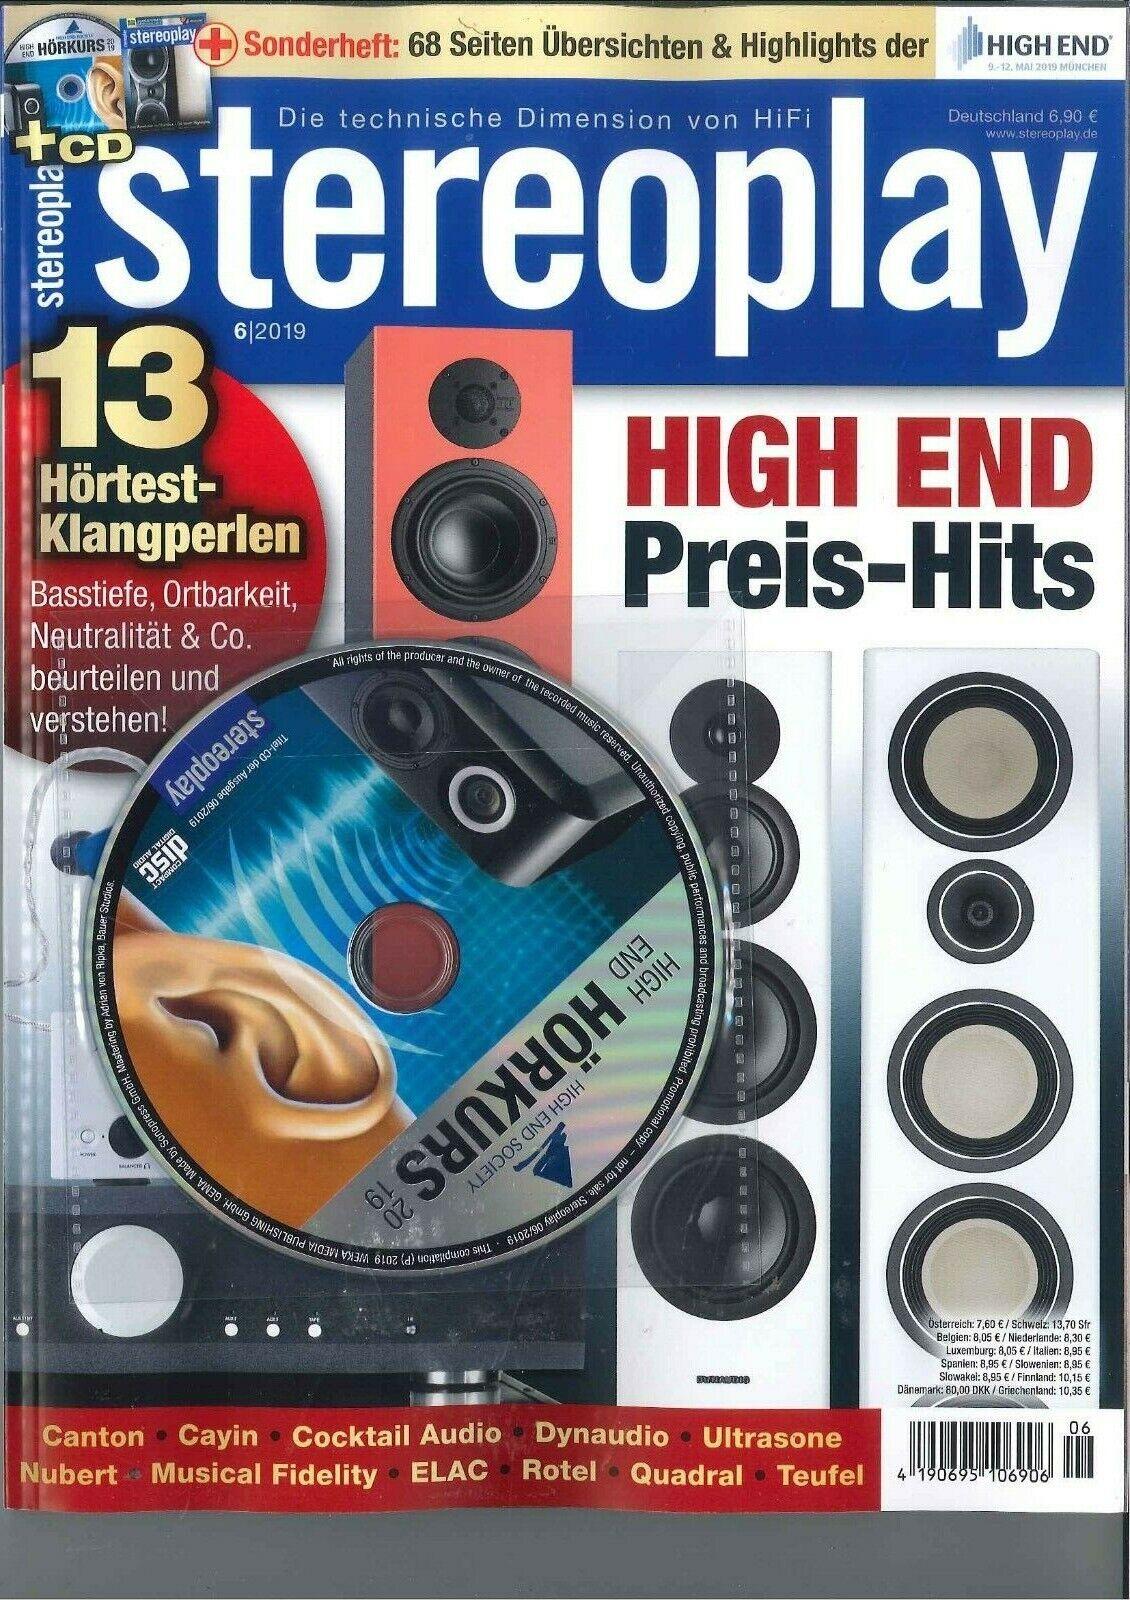 stereoplay, 06/2019: High End Preis-Hits  ++ wie neu ++